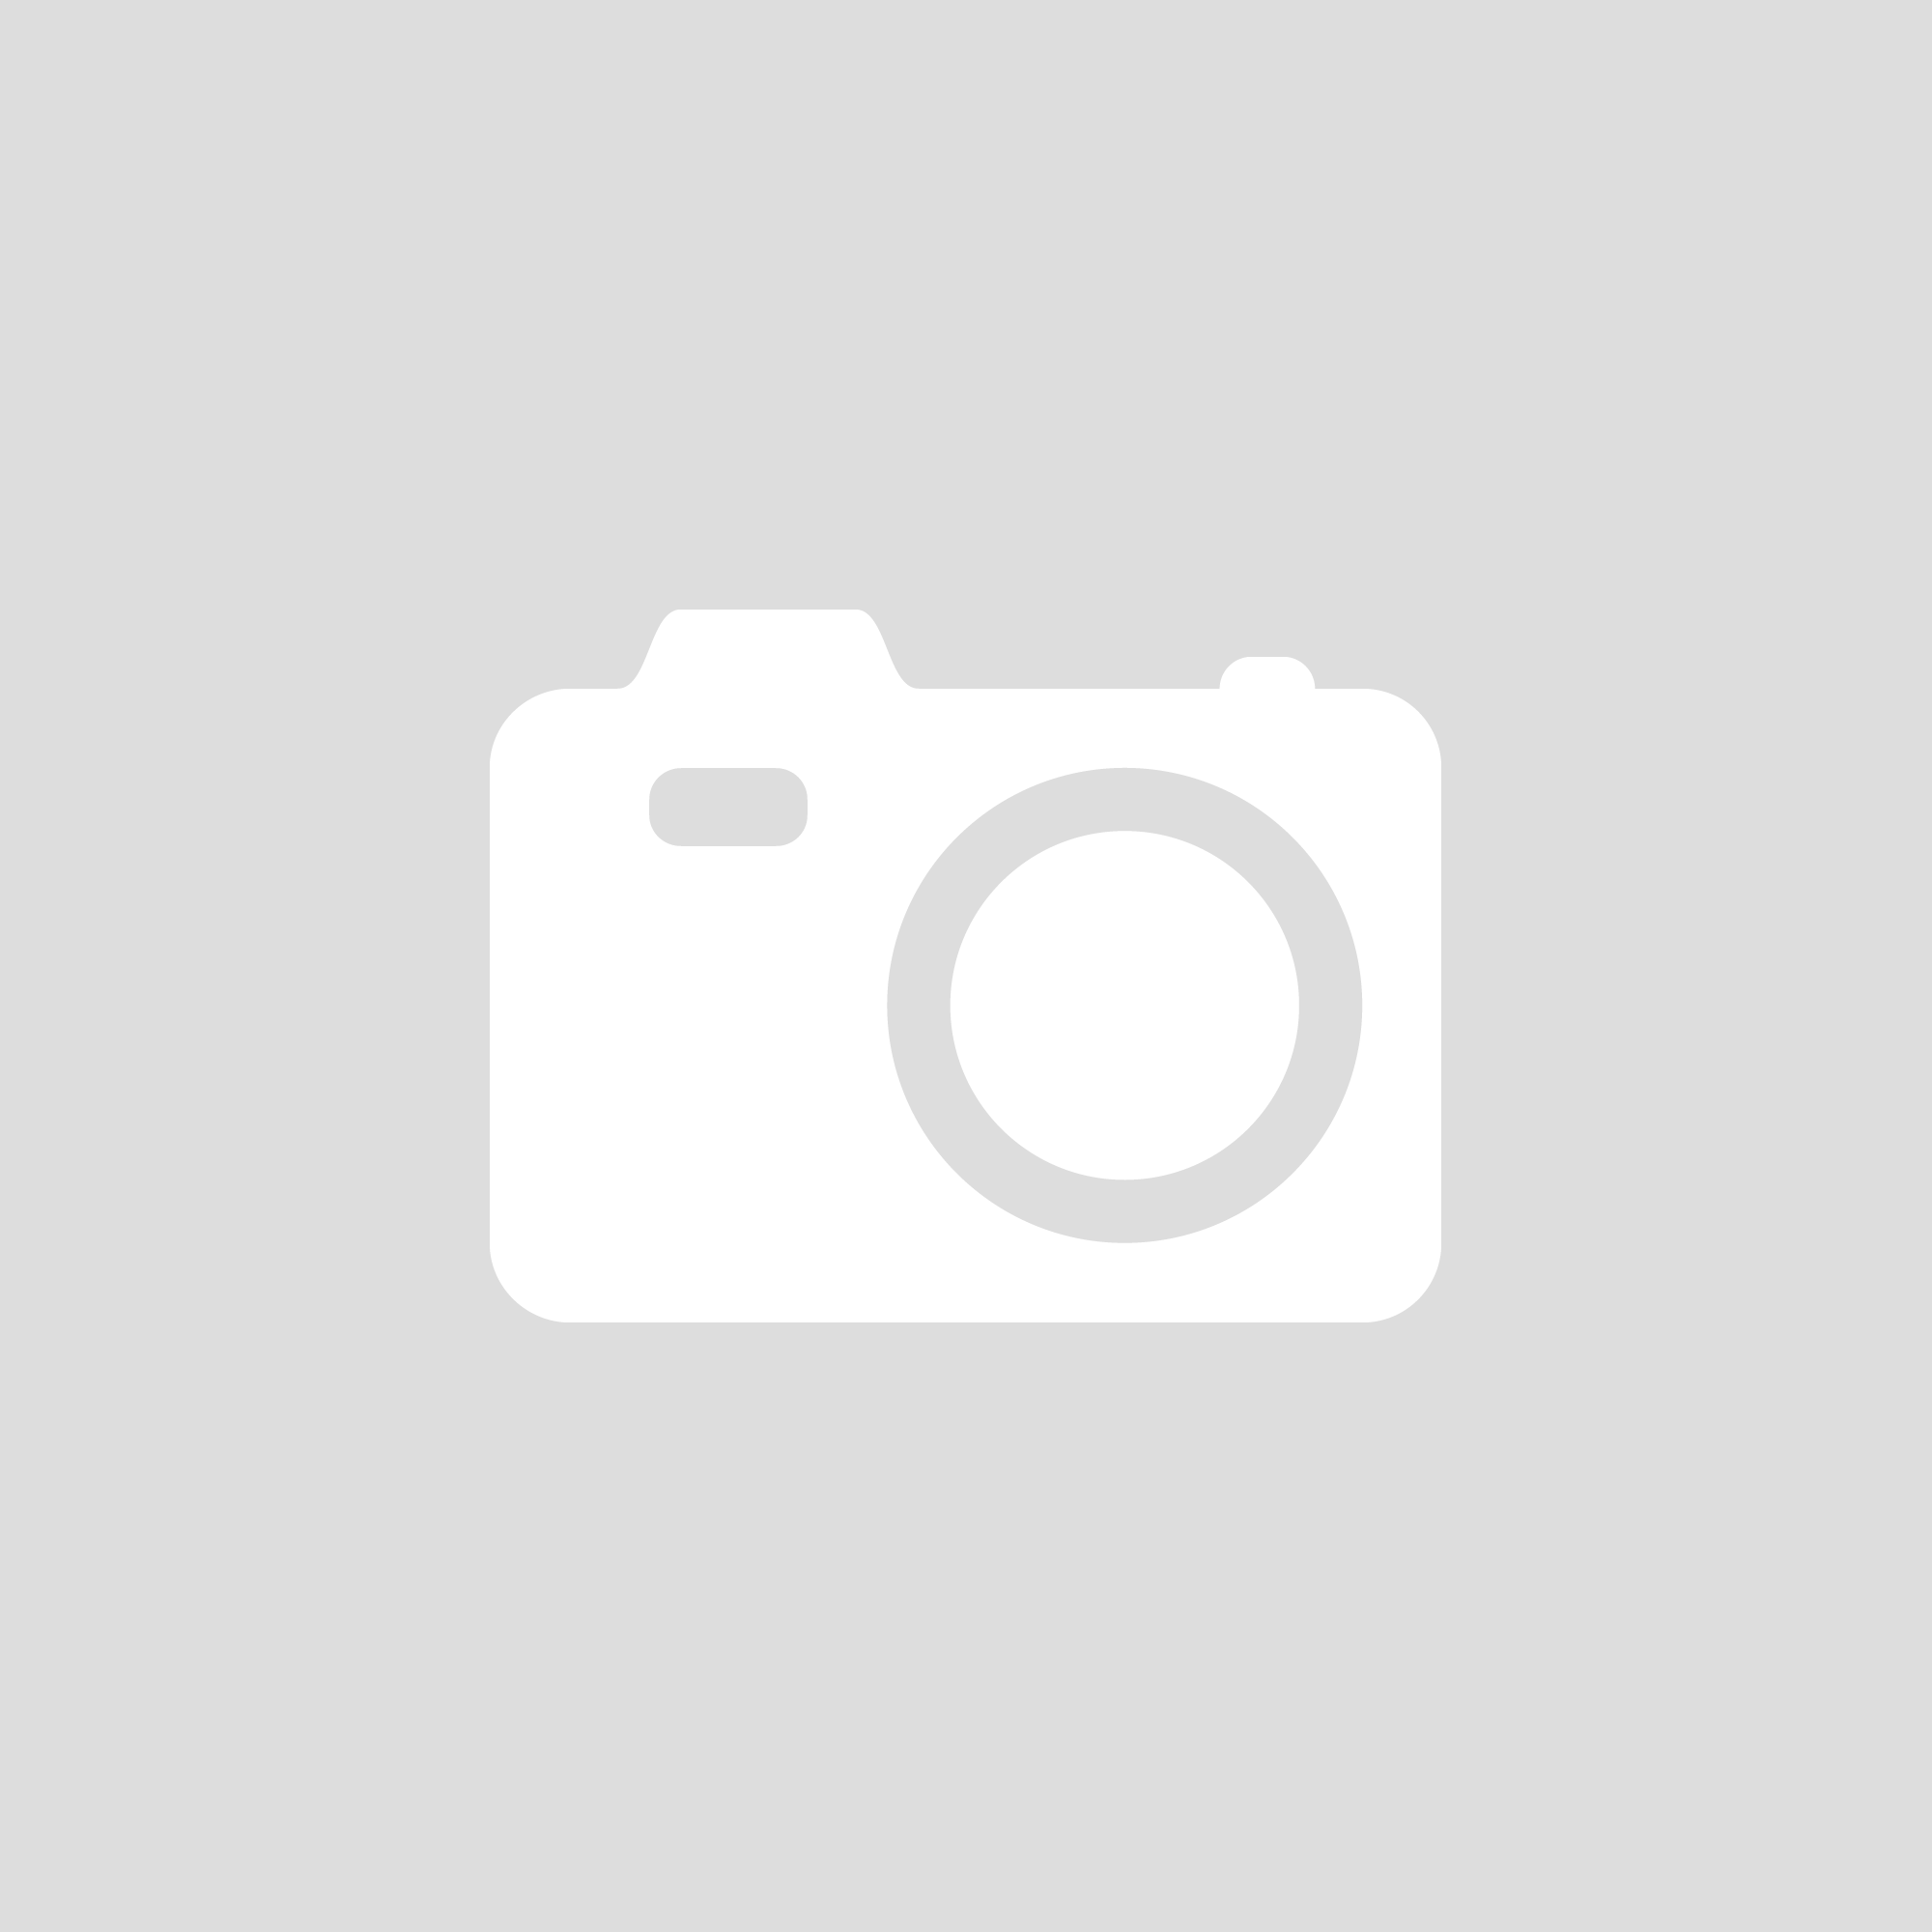 Tartan / Corduroy Bird Weighted Character Doorstop DS009-BG by CIMC